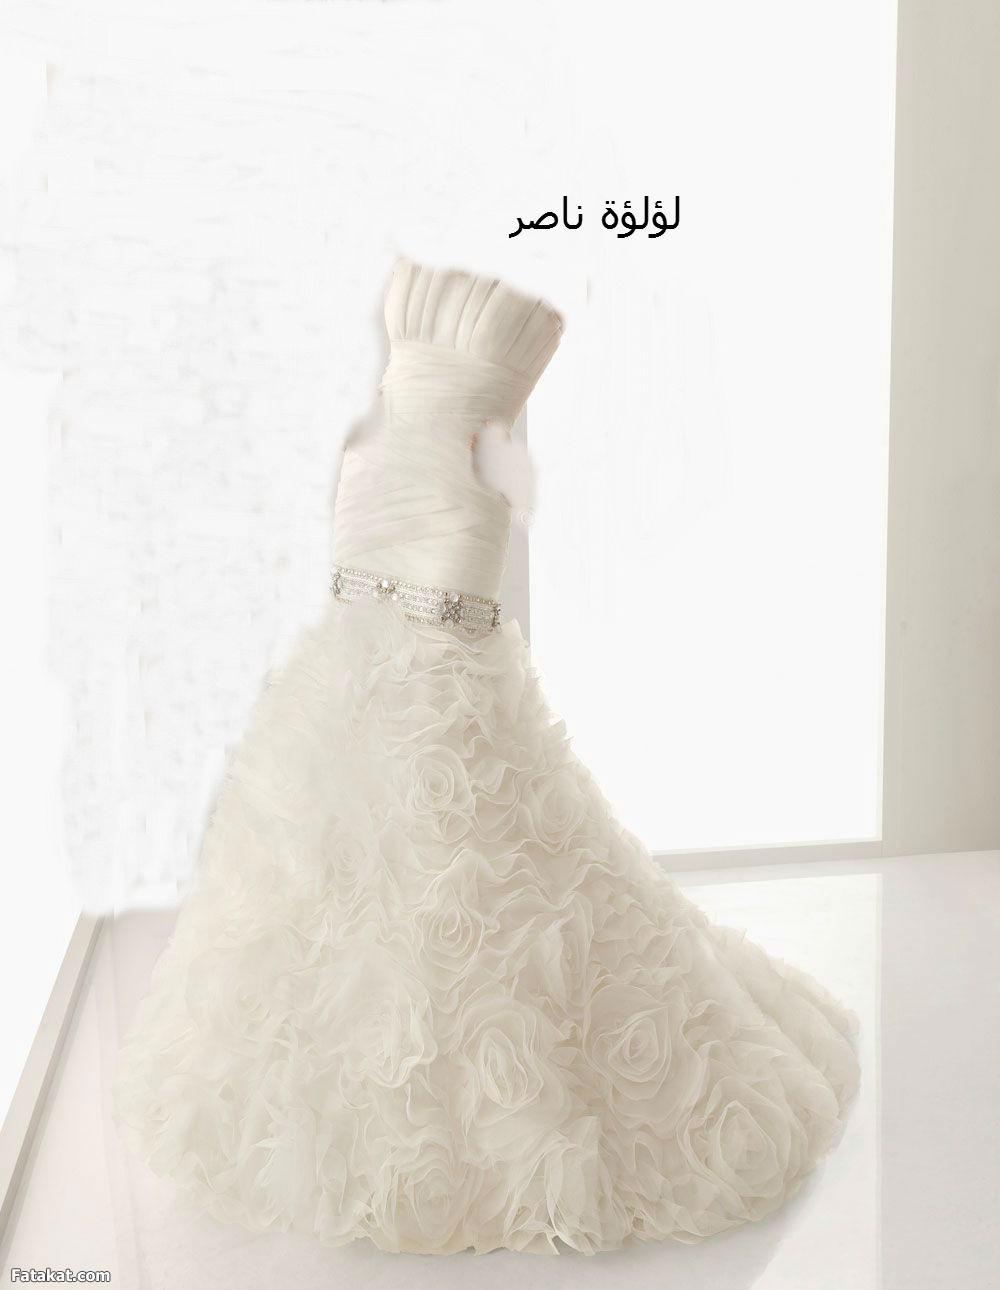 ���� ��� ������ ����� ���� ����  , ������ ��� ����� , Wedding Dresses 2015_1410132596_527.